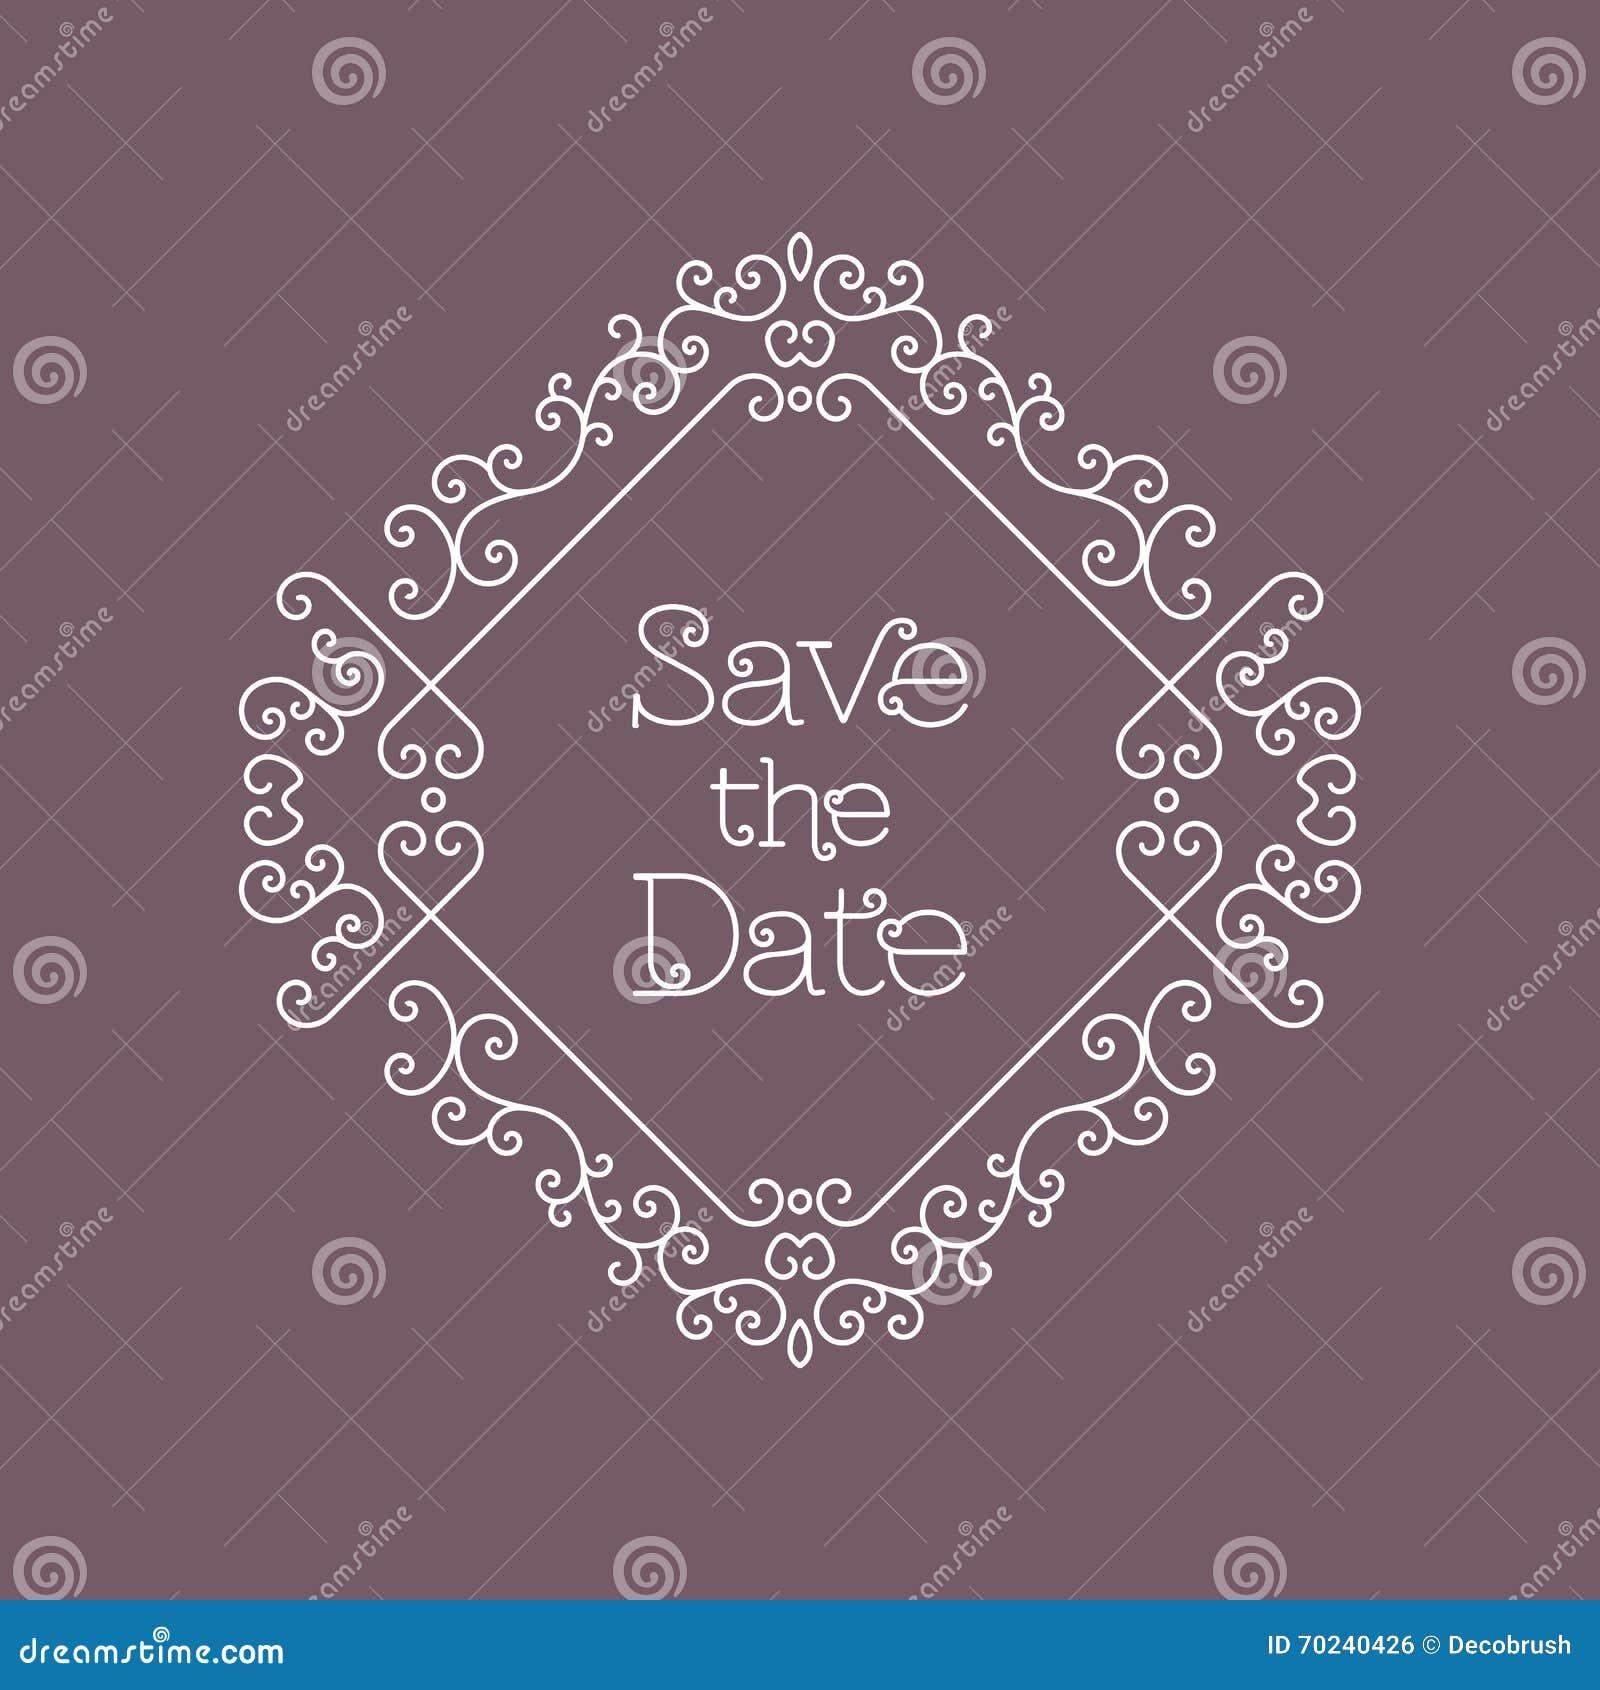 save the date card line art wedding design template stock vector